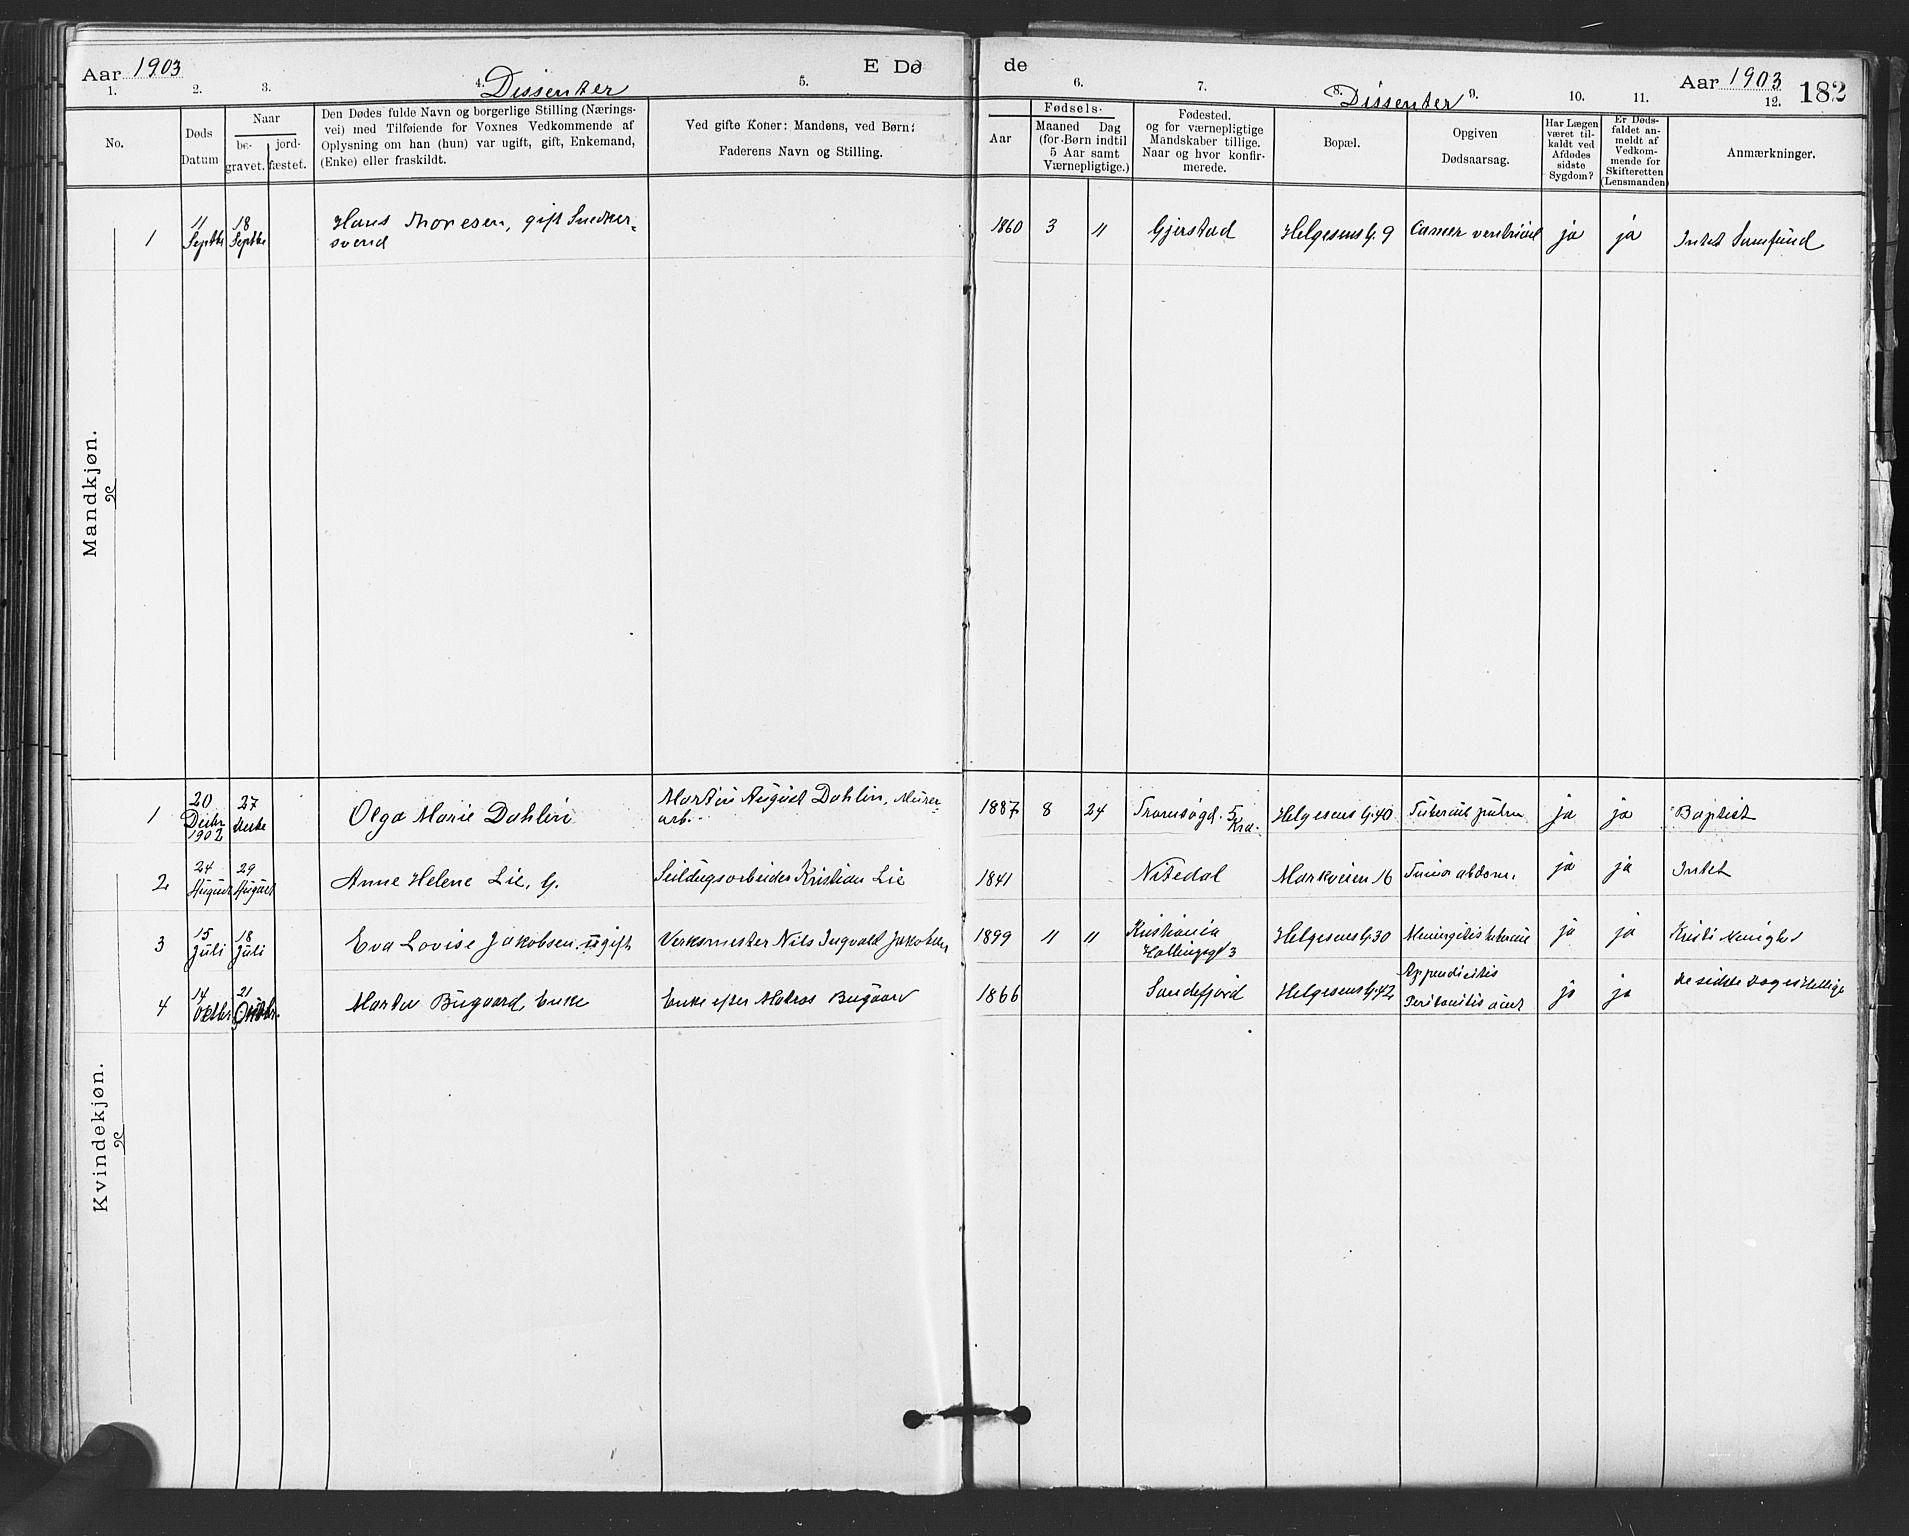 SAO, Paulus prestekontor Kirkebøker, F/Fa/L0012: Ministerialbok nr. 12, 1897-1908, s. 182